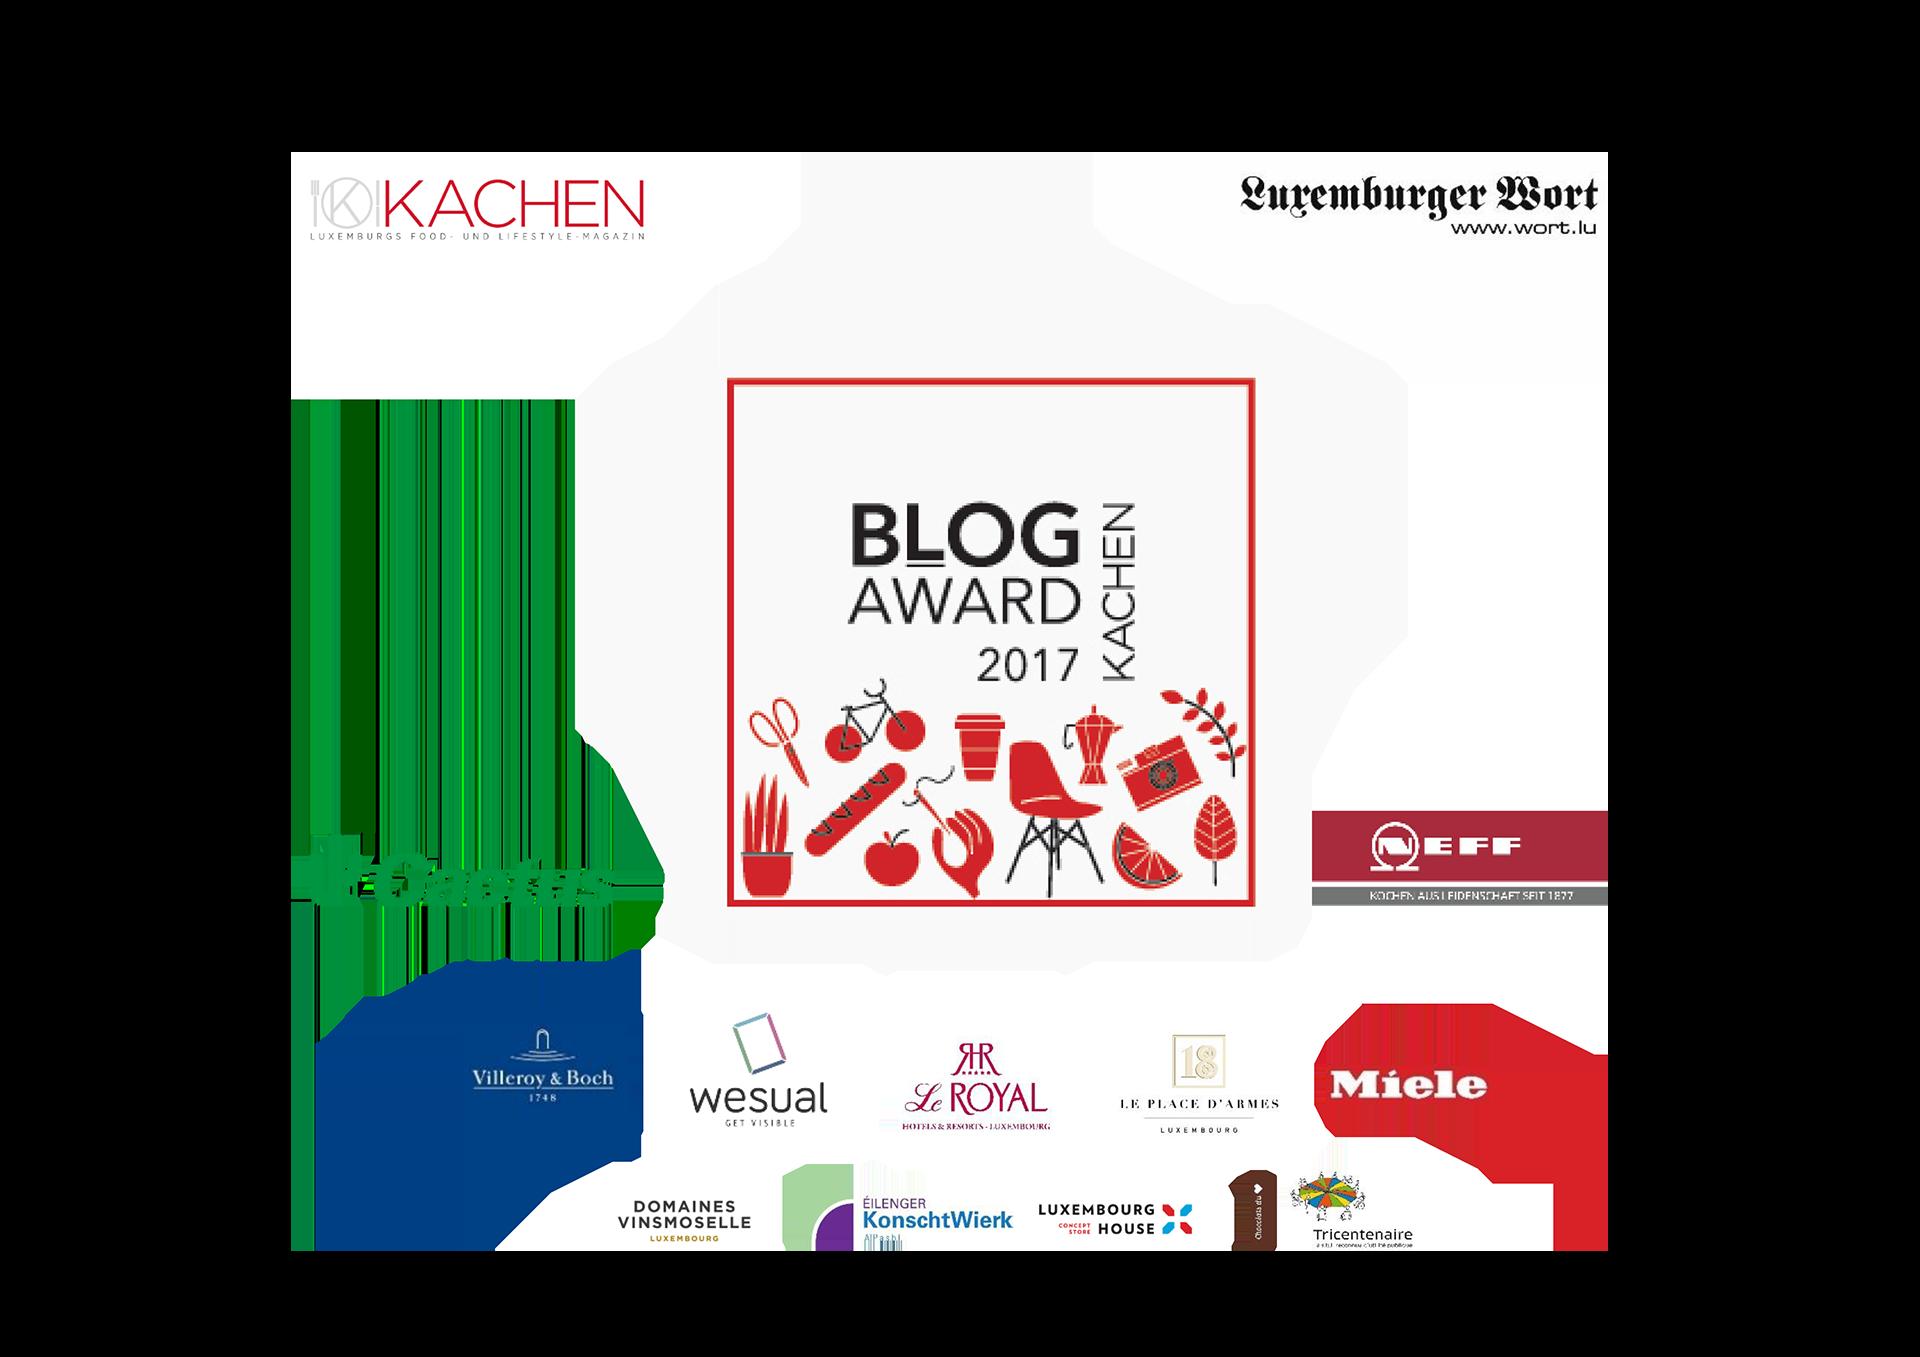 KACHEN Blog Award 2017